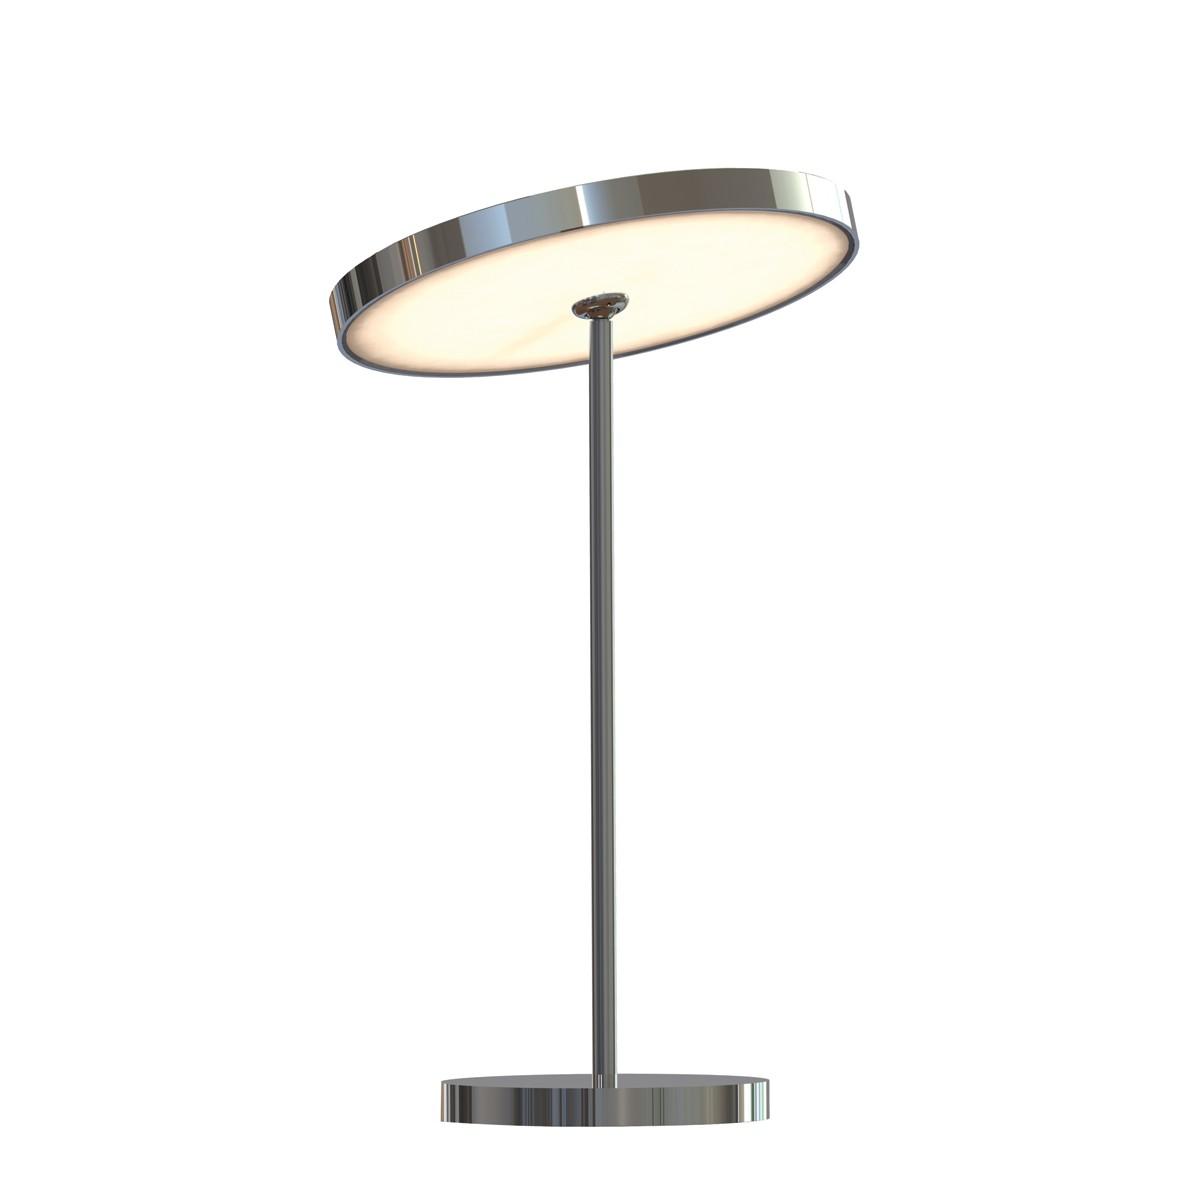 Top Light Sun Table Tischleuchte 30, Ø: 21 cm